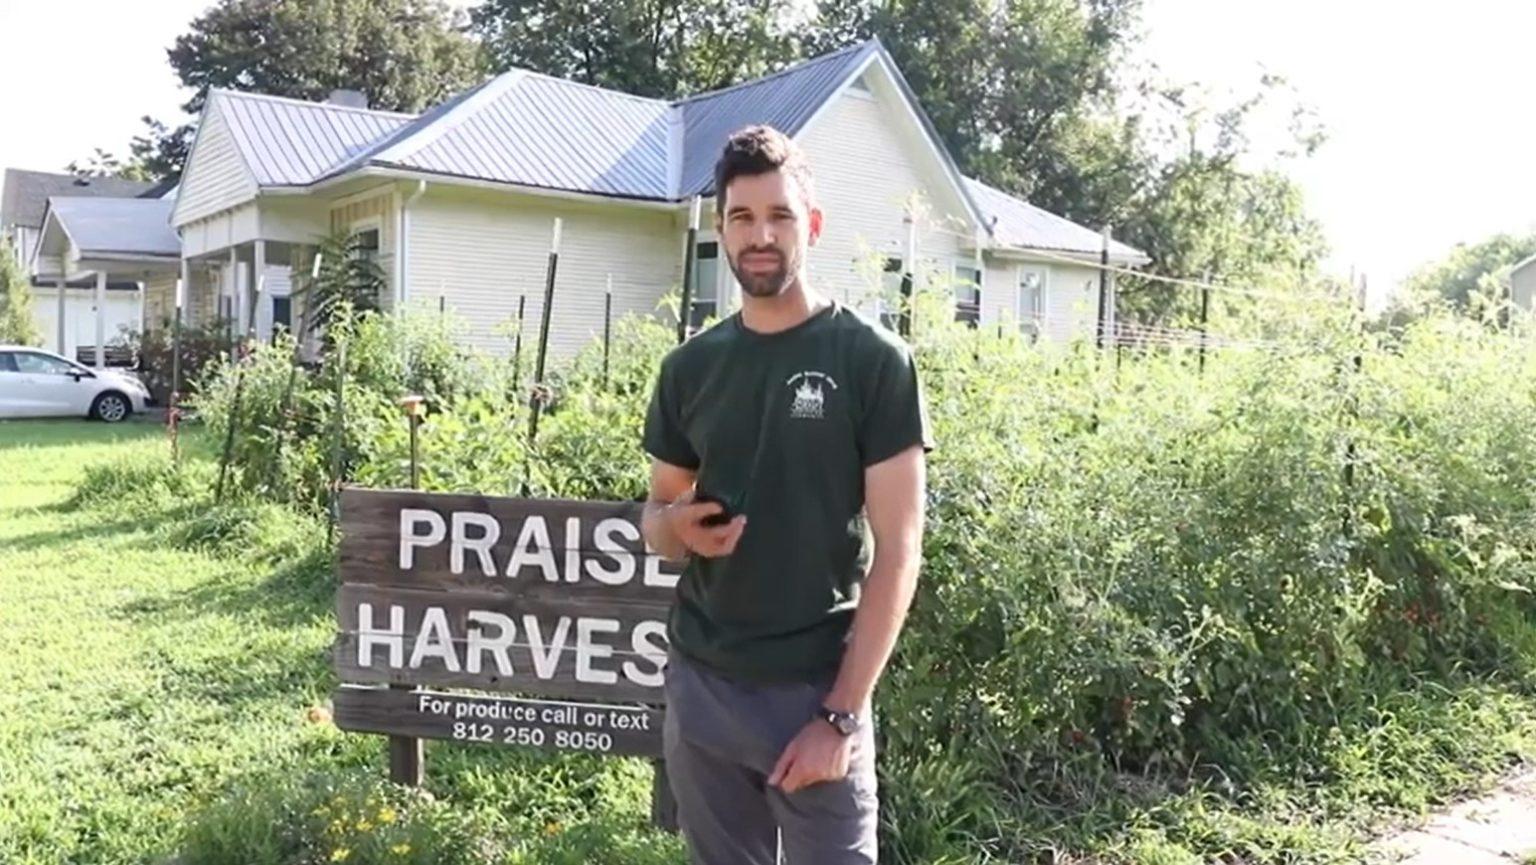 Praise Harvest Summer Tour